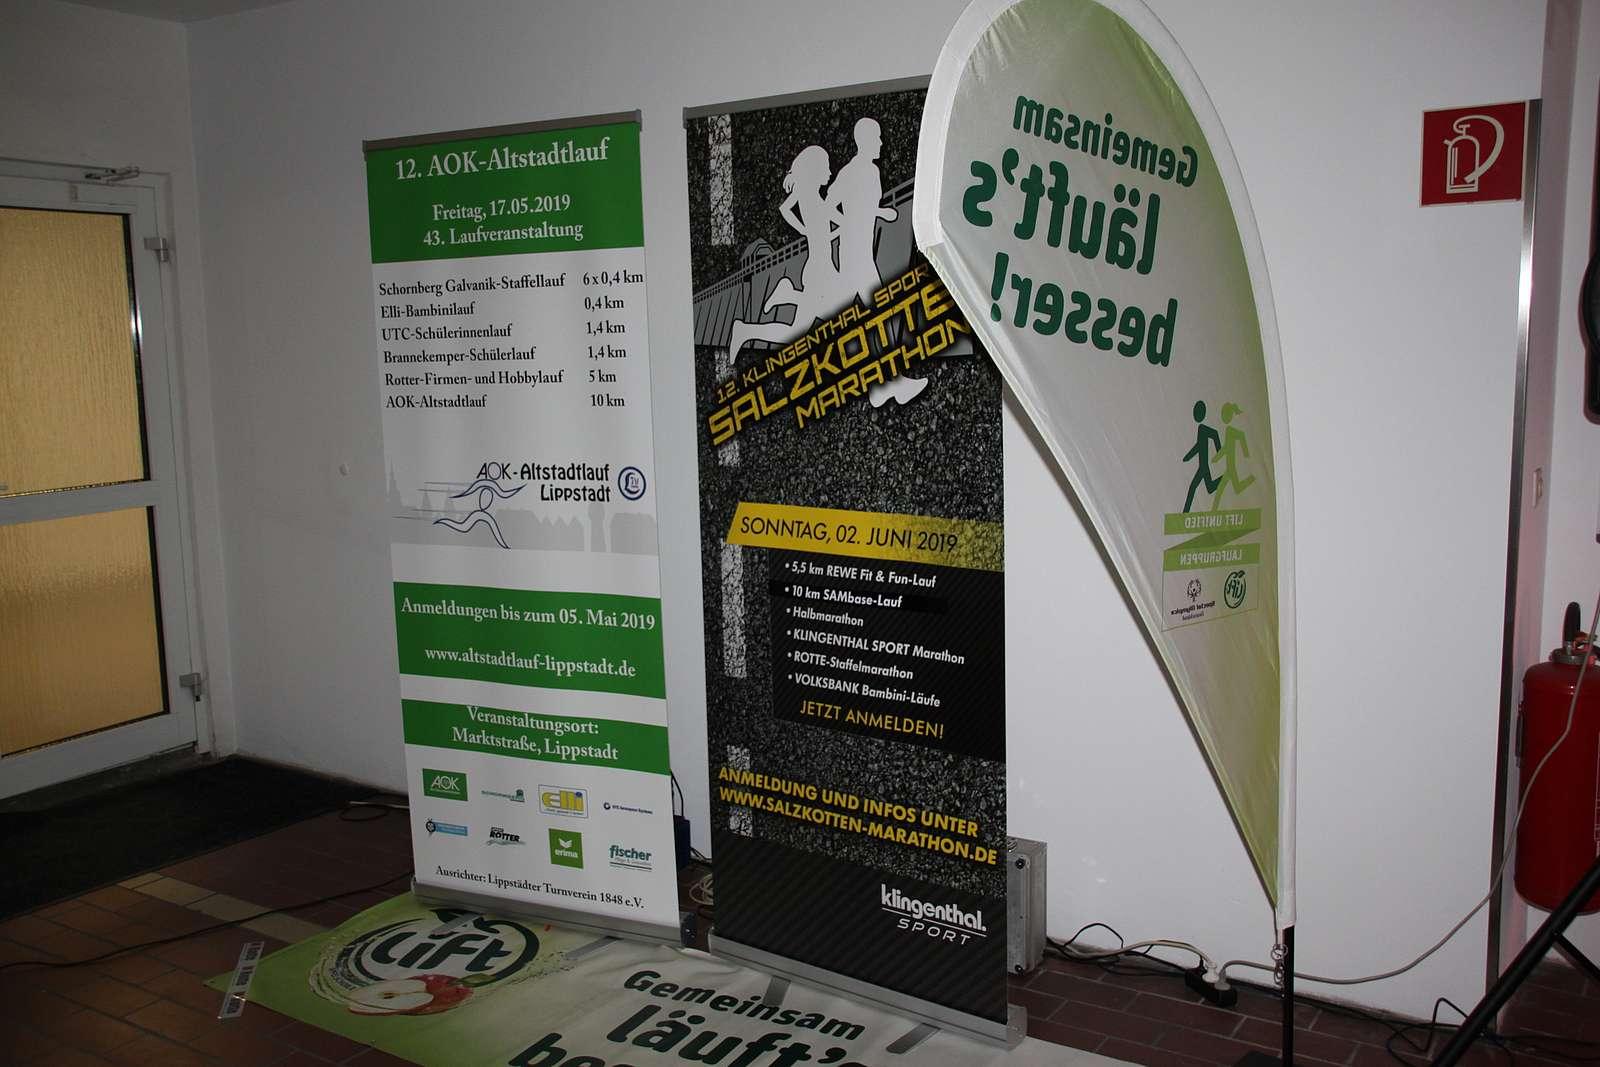 Klingenthal Sport Marathon Rotte